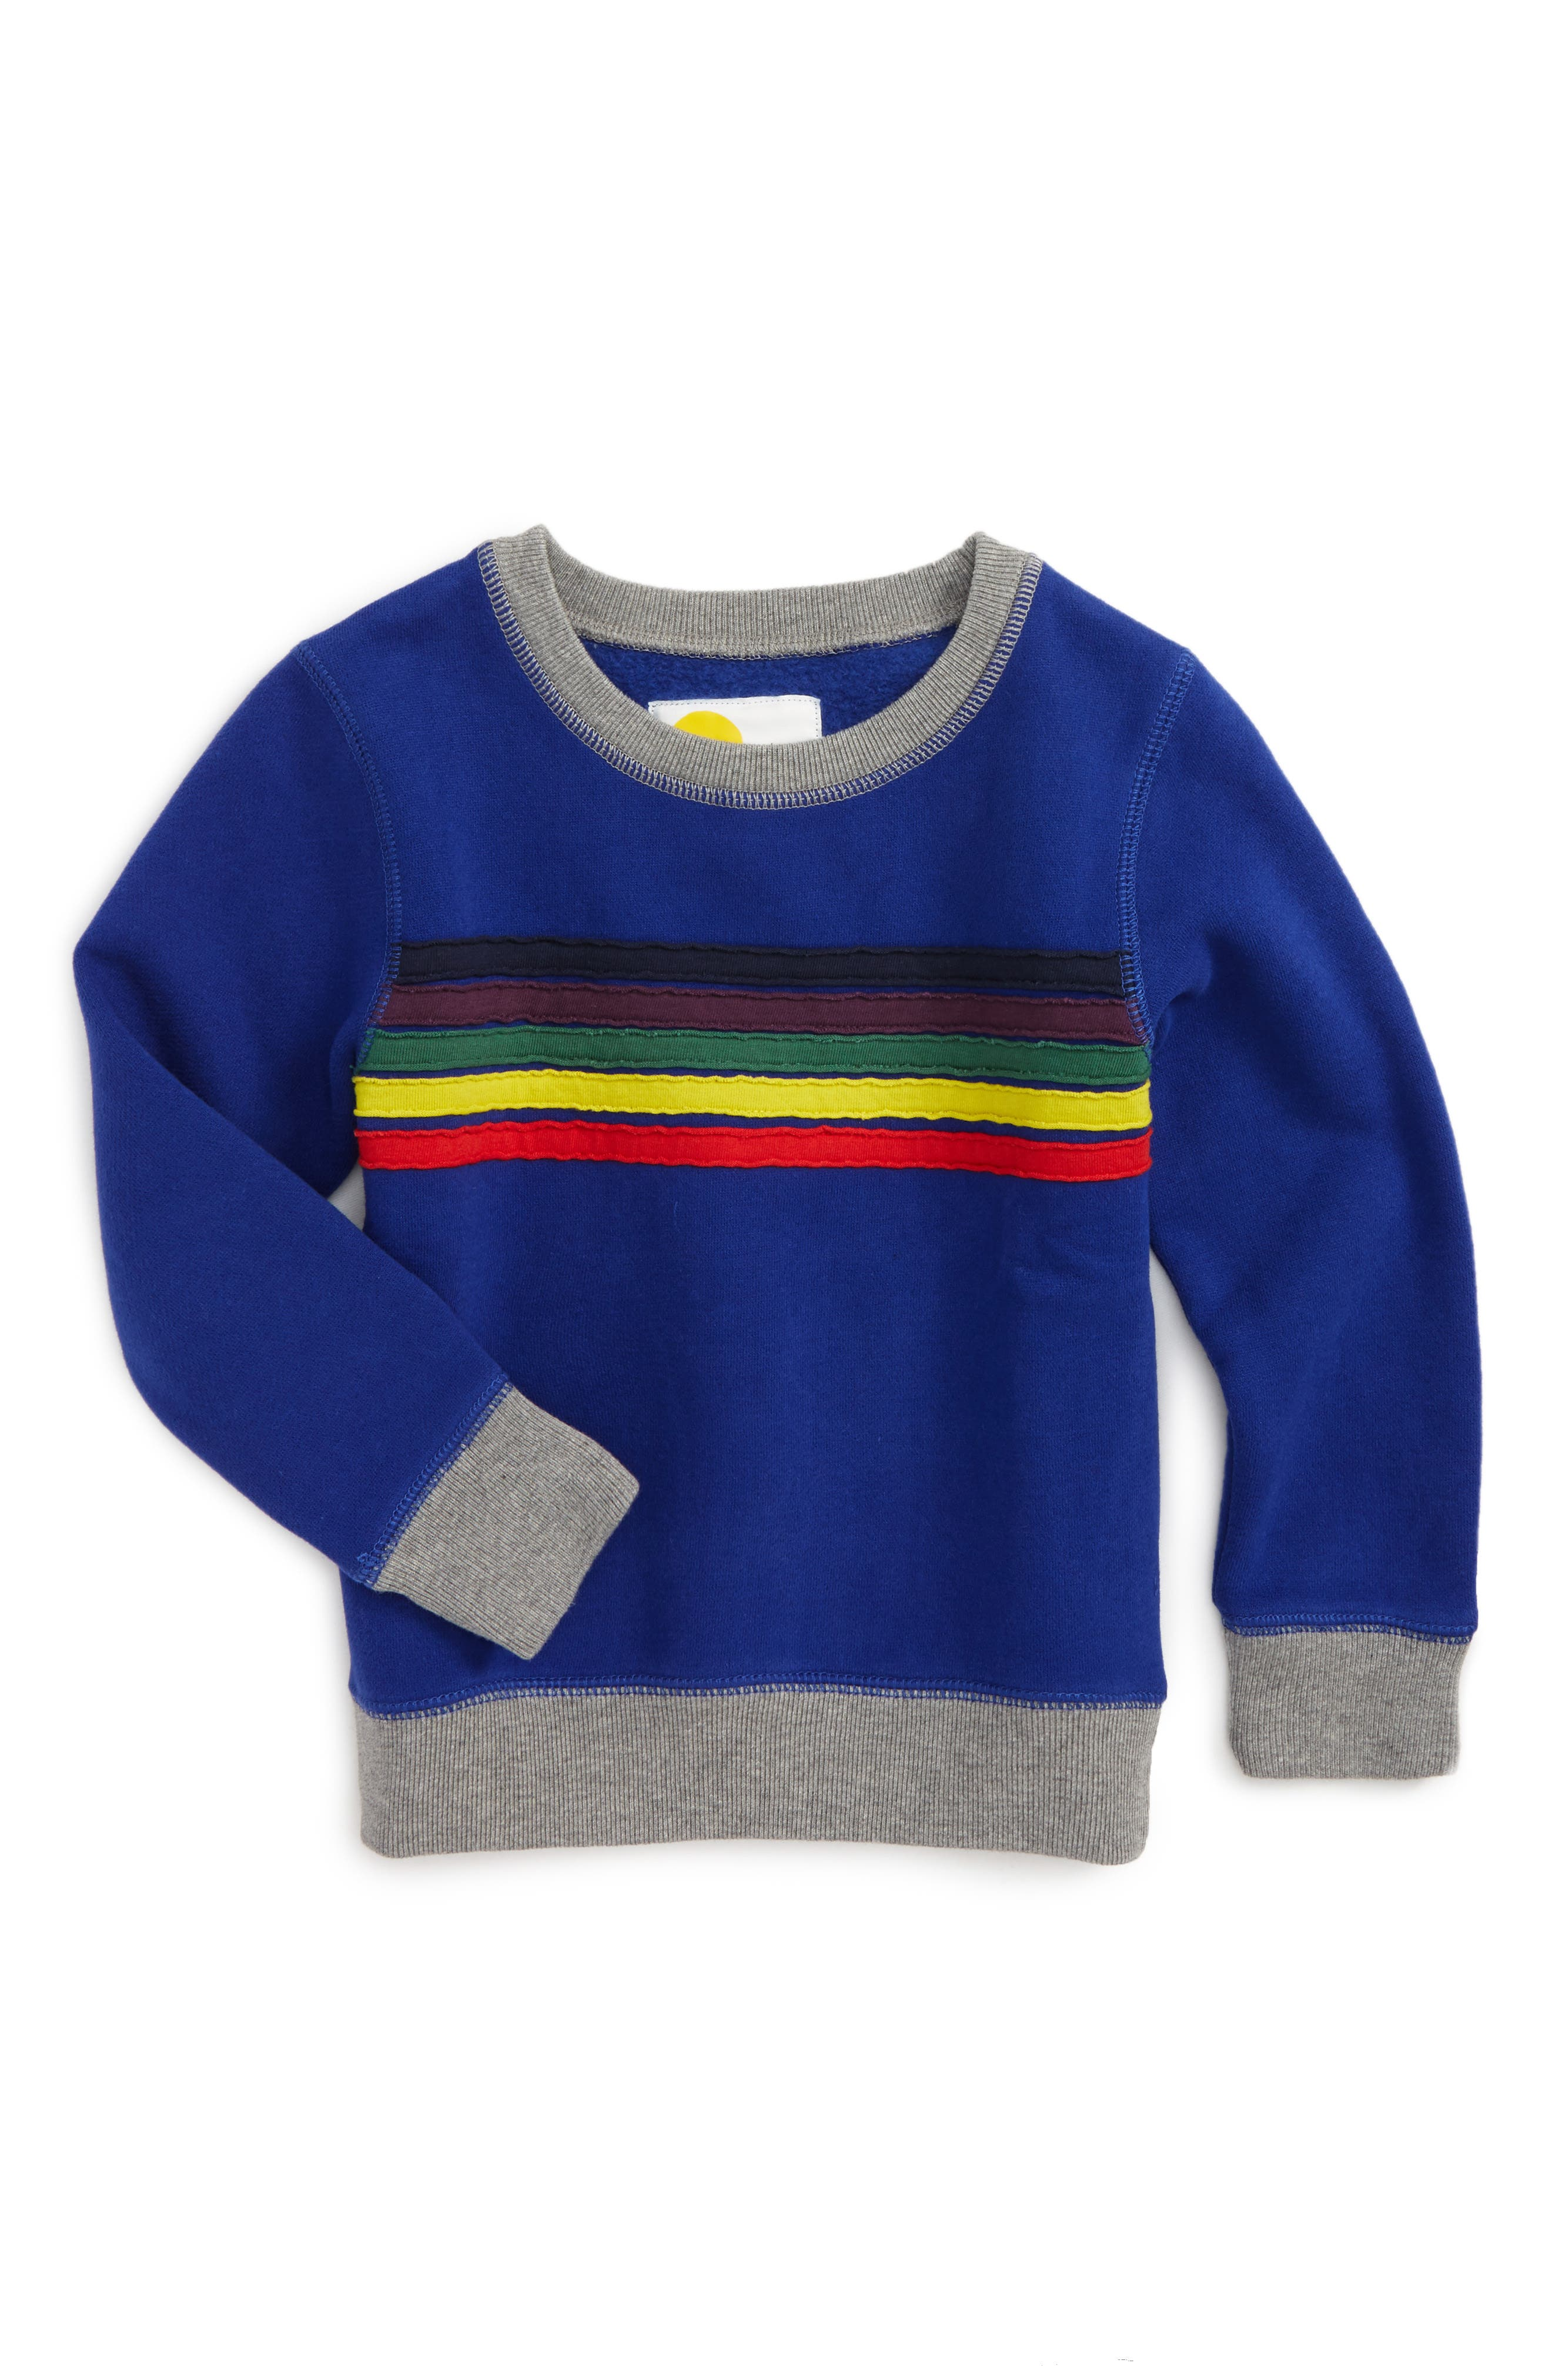 Main Image - Mini Boden Fun Sweatshirt (Toddler Boys, Little Boys & Big Boys)